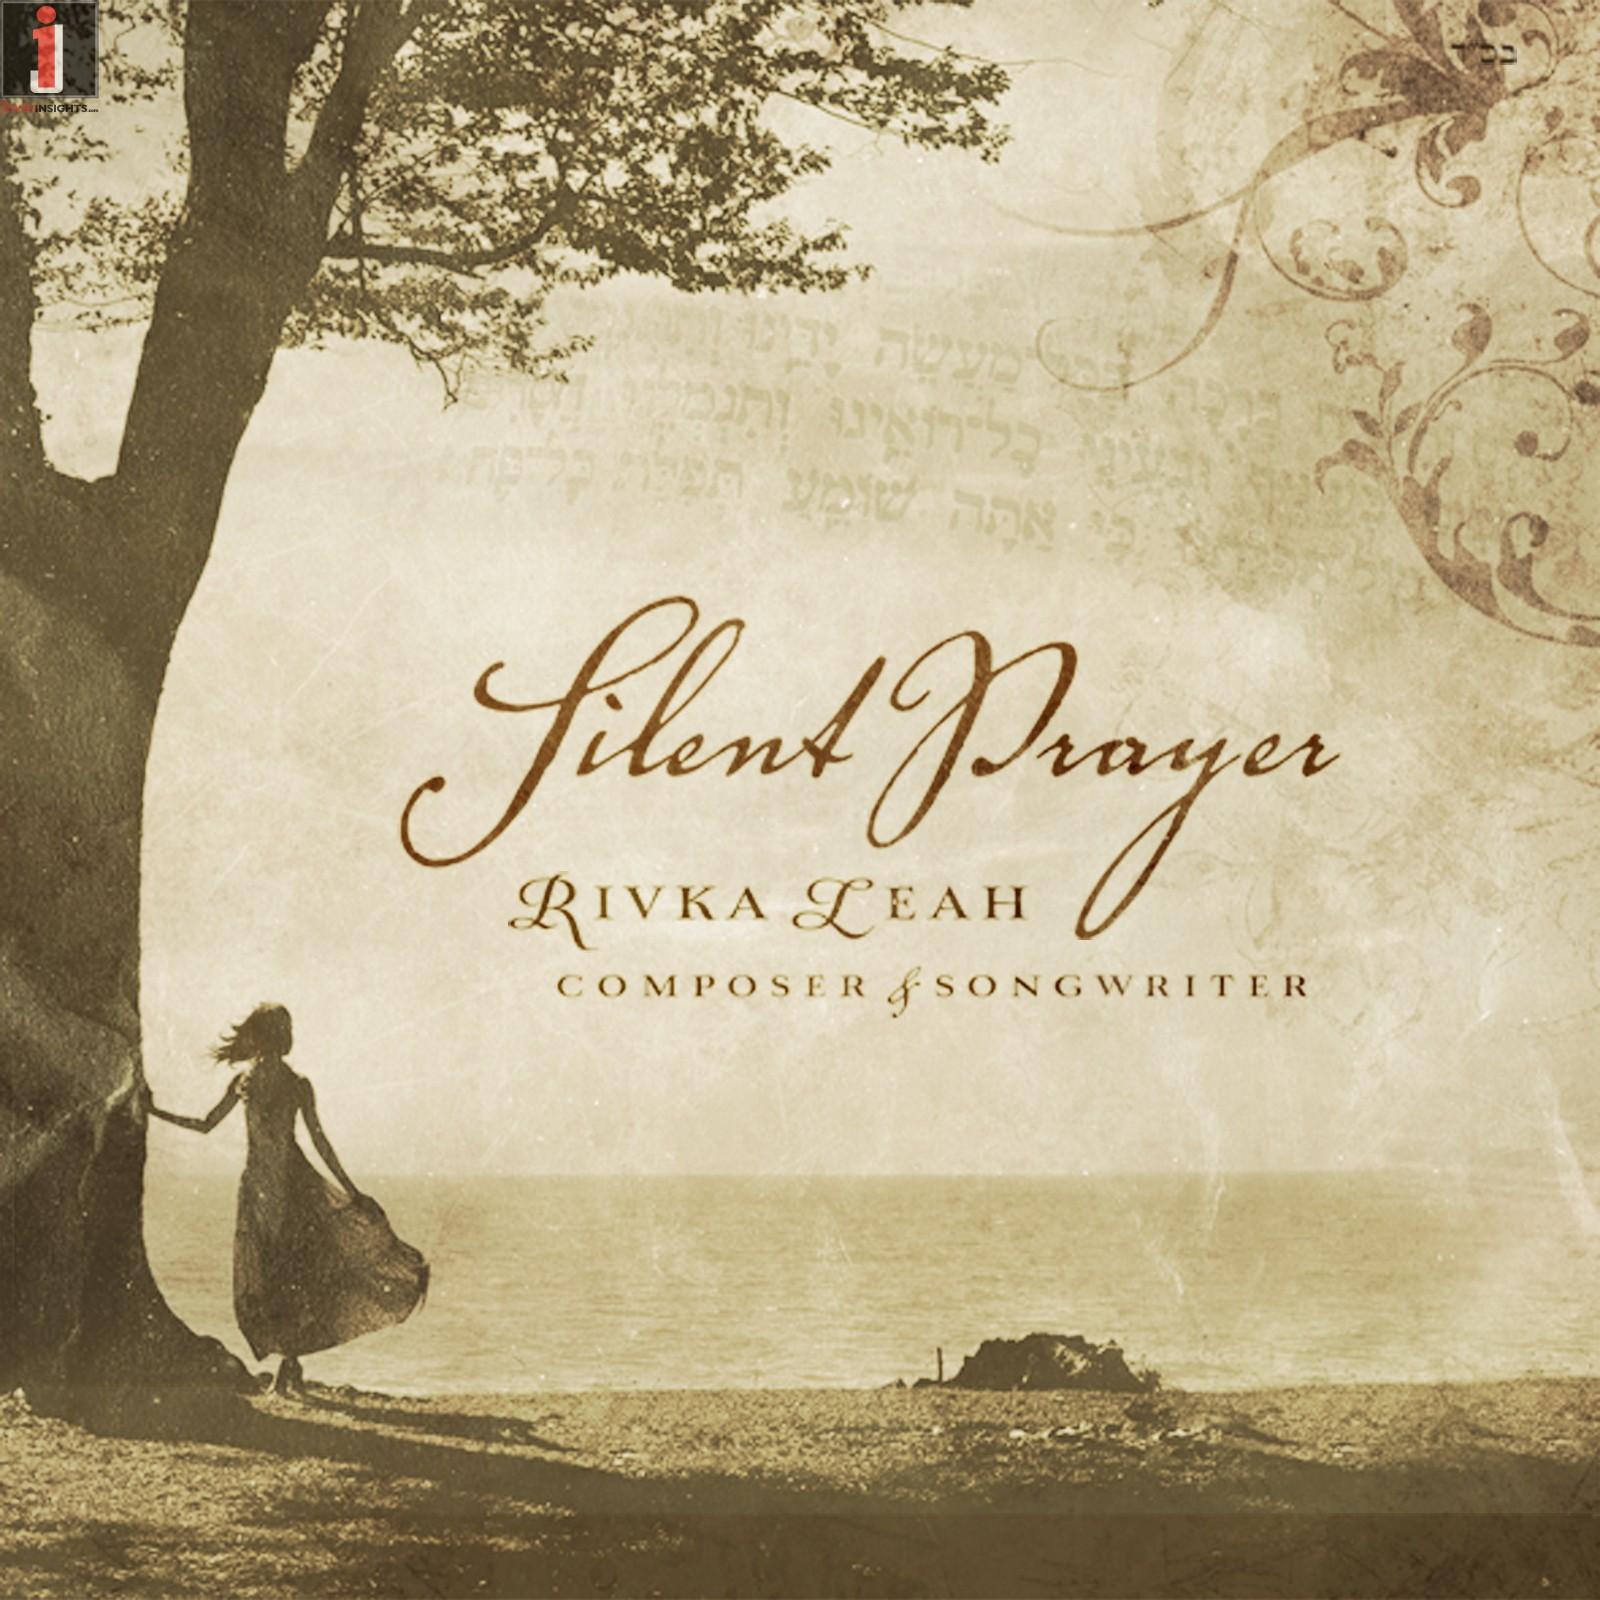 album cover silent prayer_Large